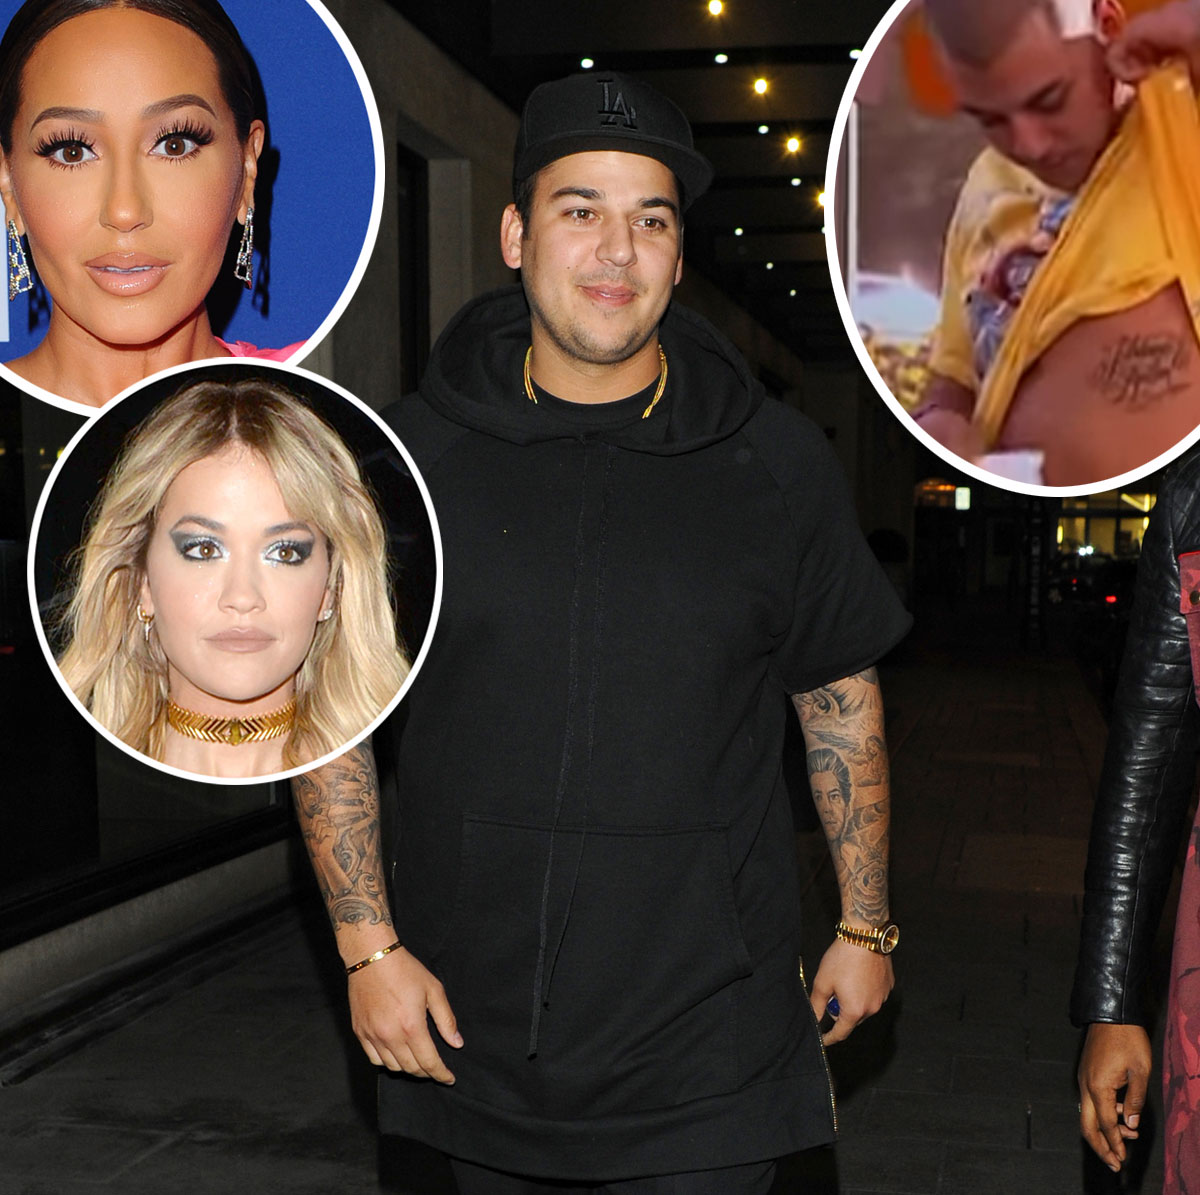 Rob Kardashian covers up Rita Ora and Adrienne Bailon tattoos